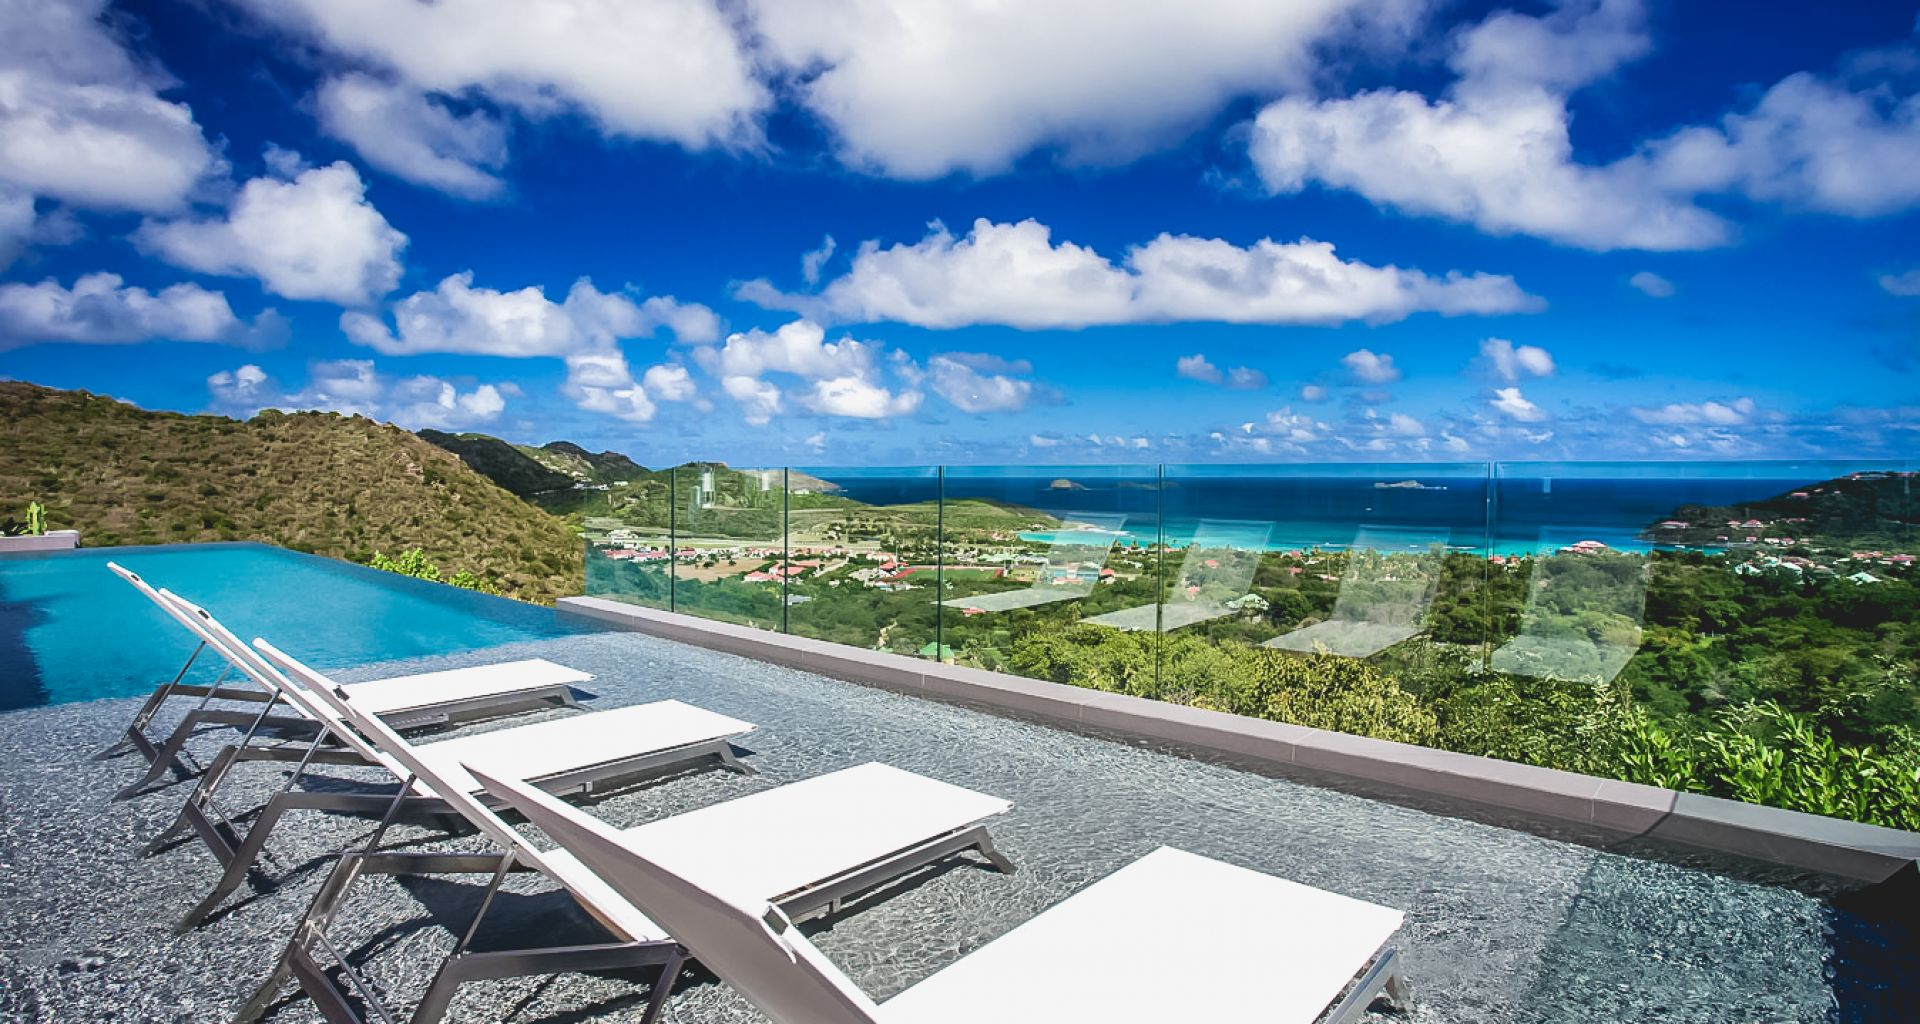 Villa Bastide, St-Barts, Caribbean